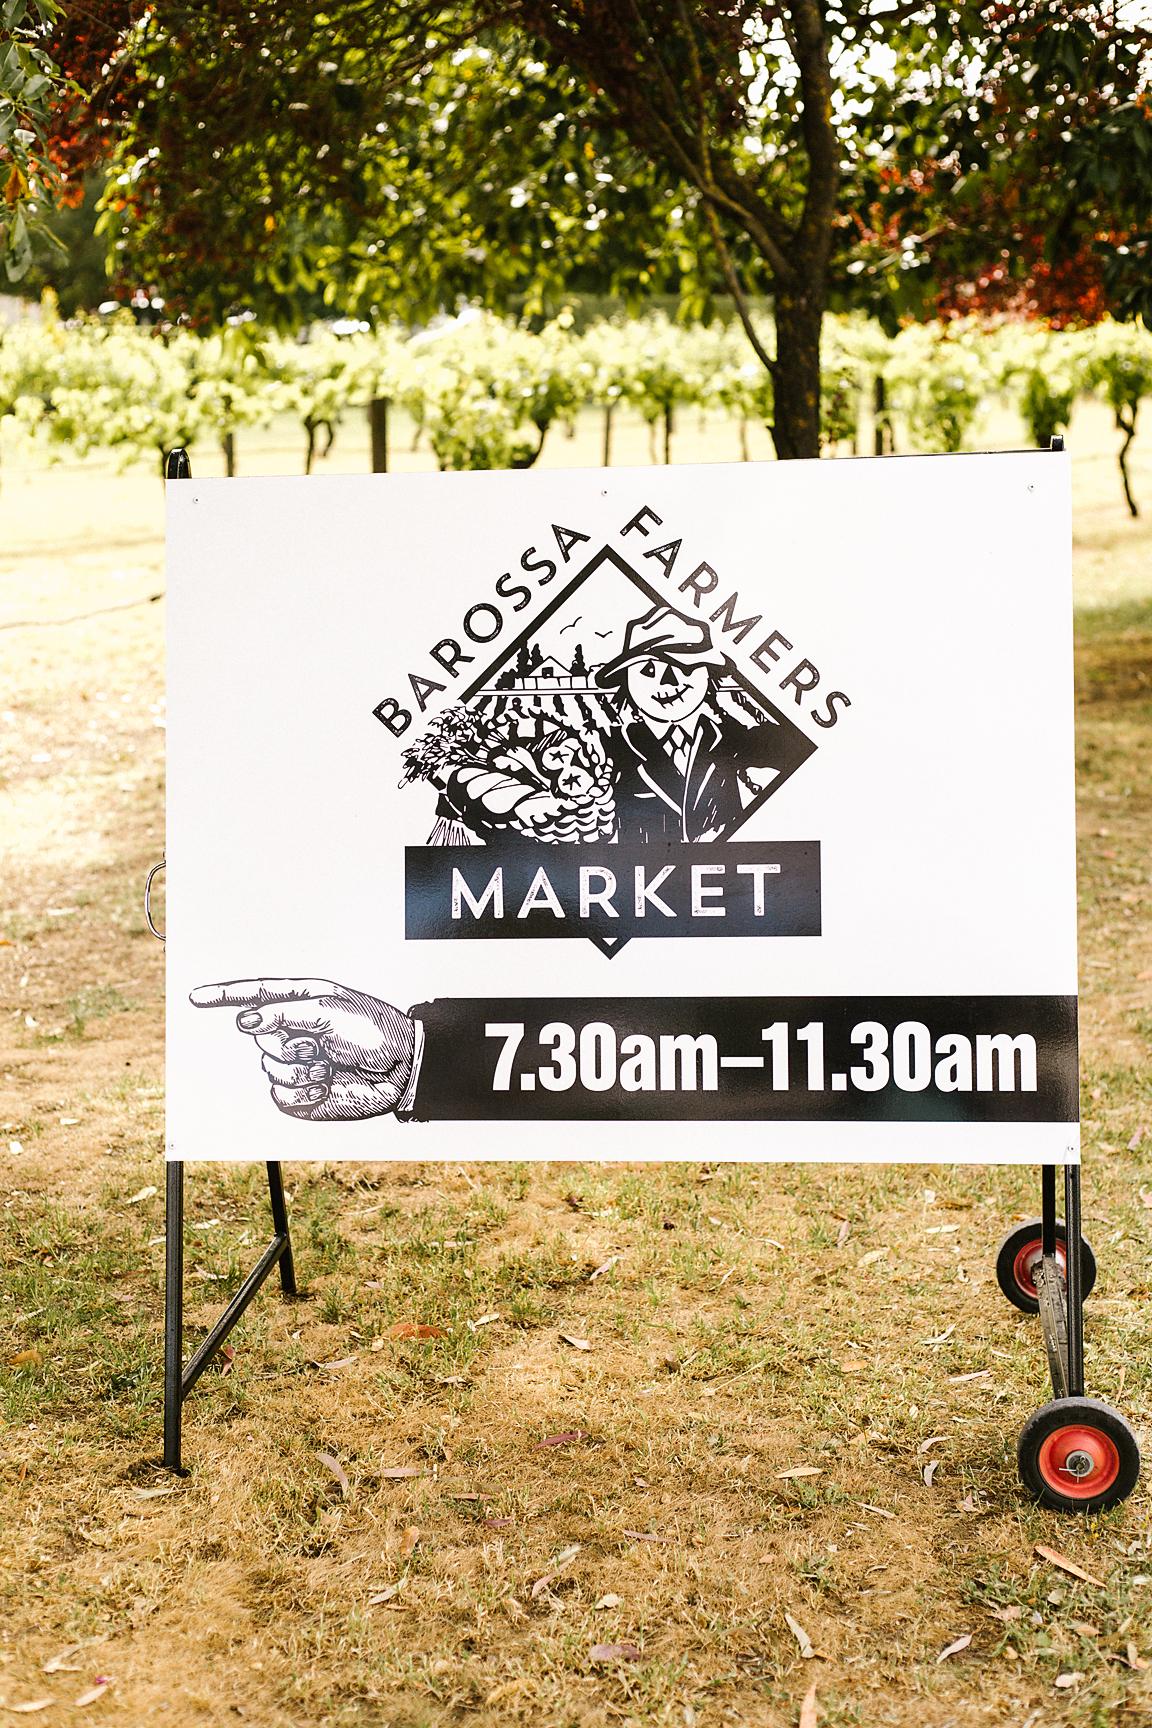 Barossa Farmer's Market is open on Saturday mornings